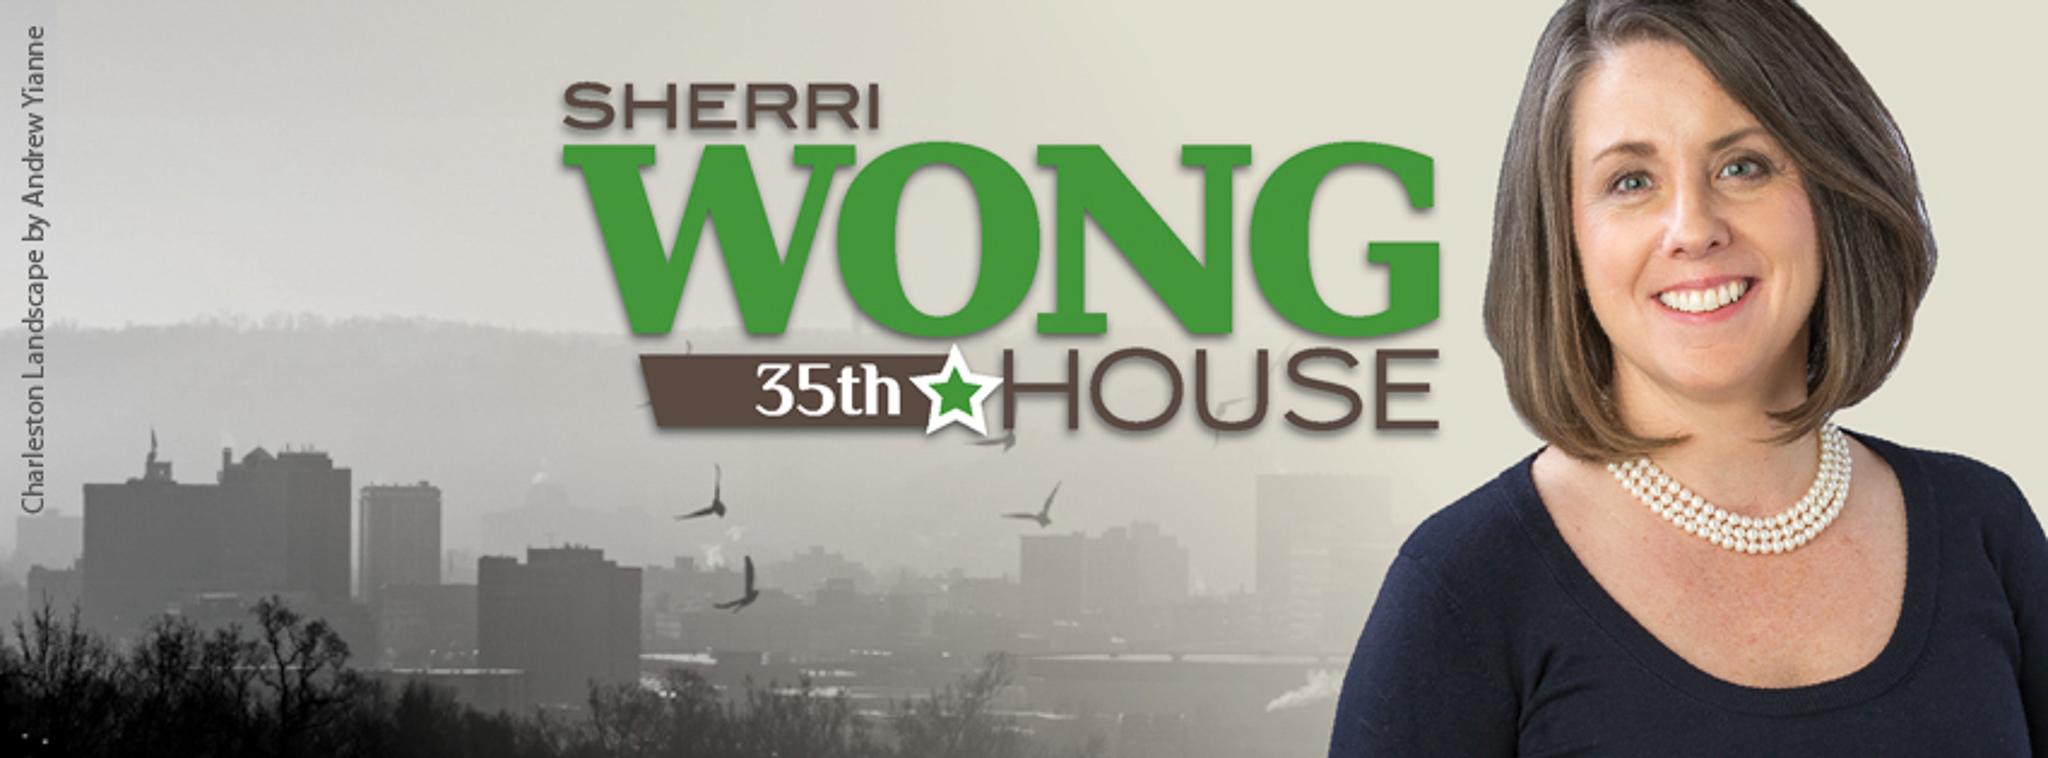 Advertising for Sherri Wong